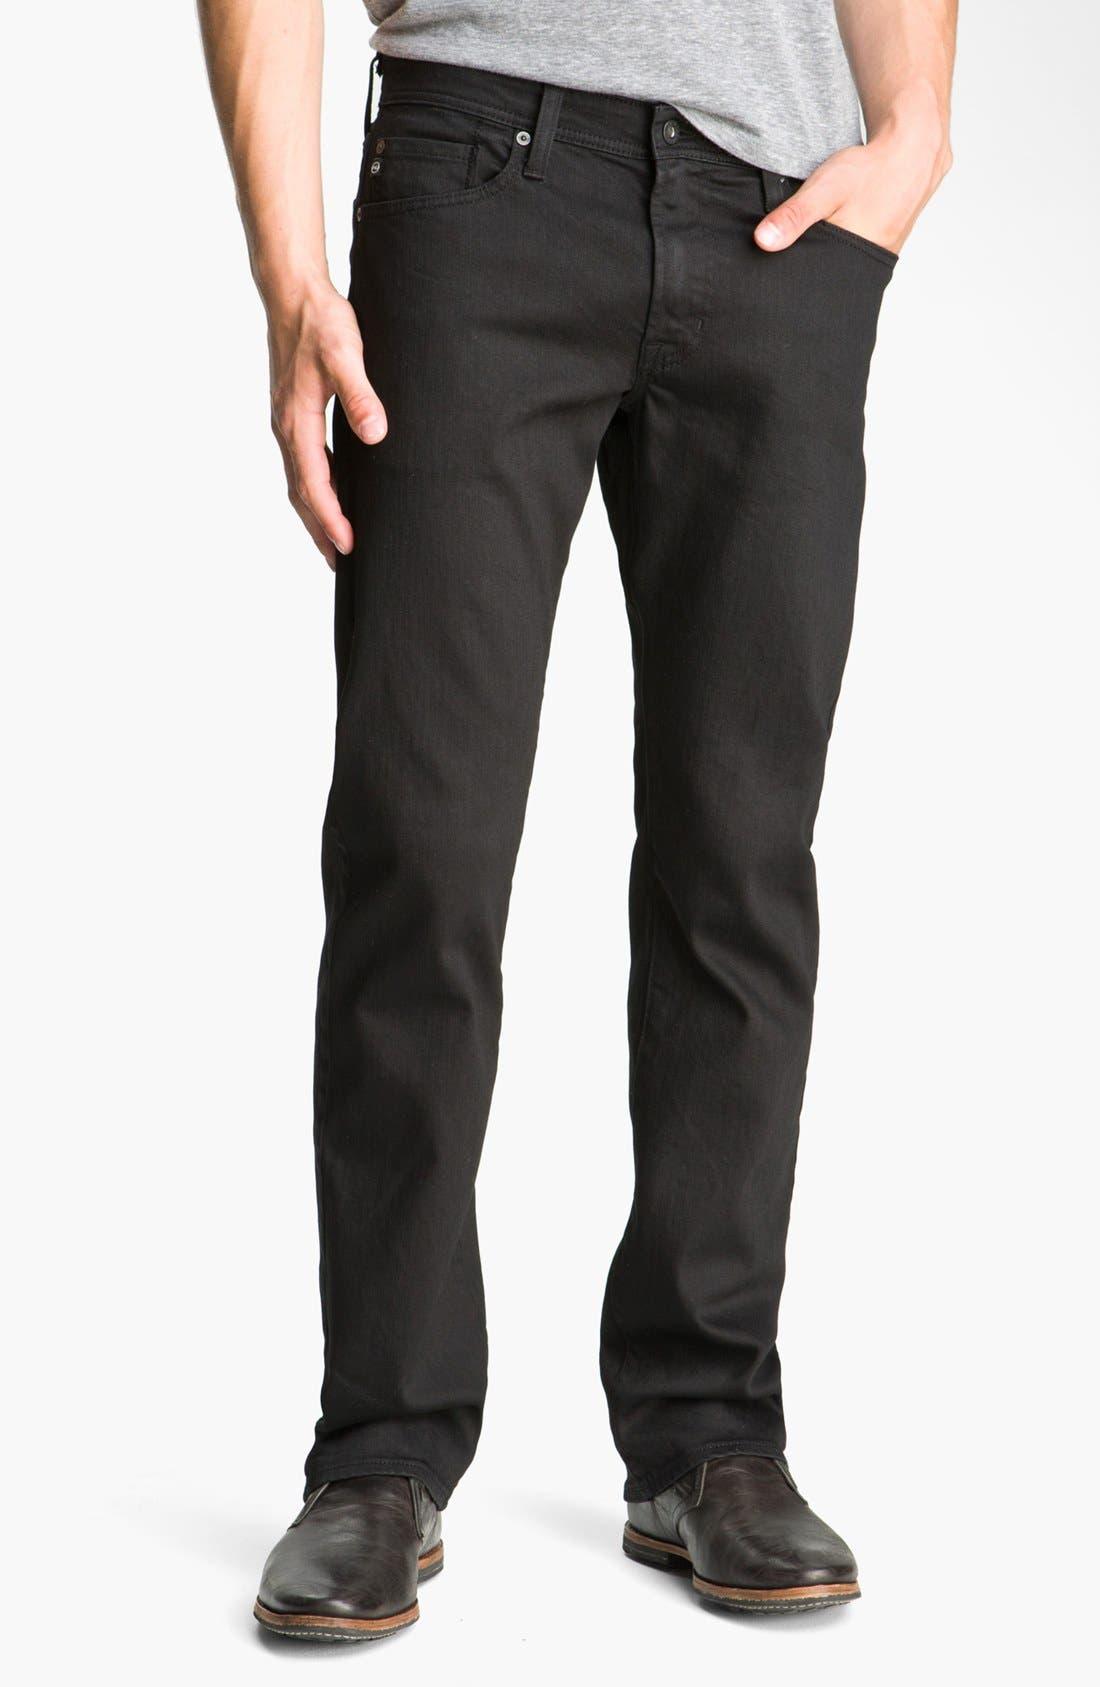 'Protégé' Straight Leg Jeans,                         Main,                         color, Black Overdye